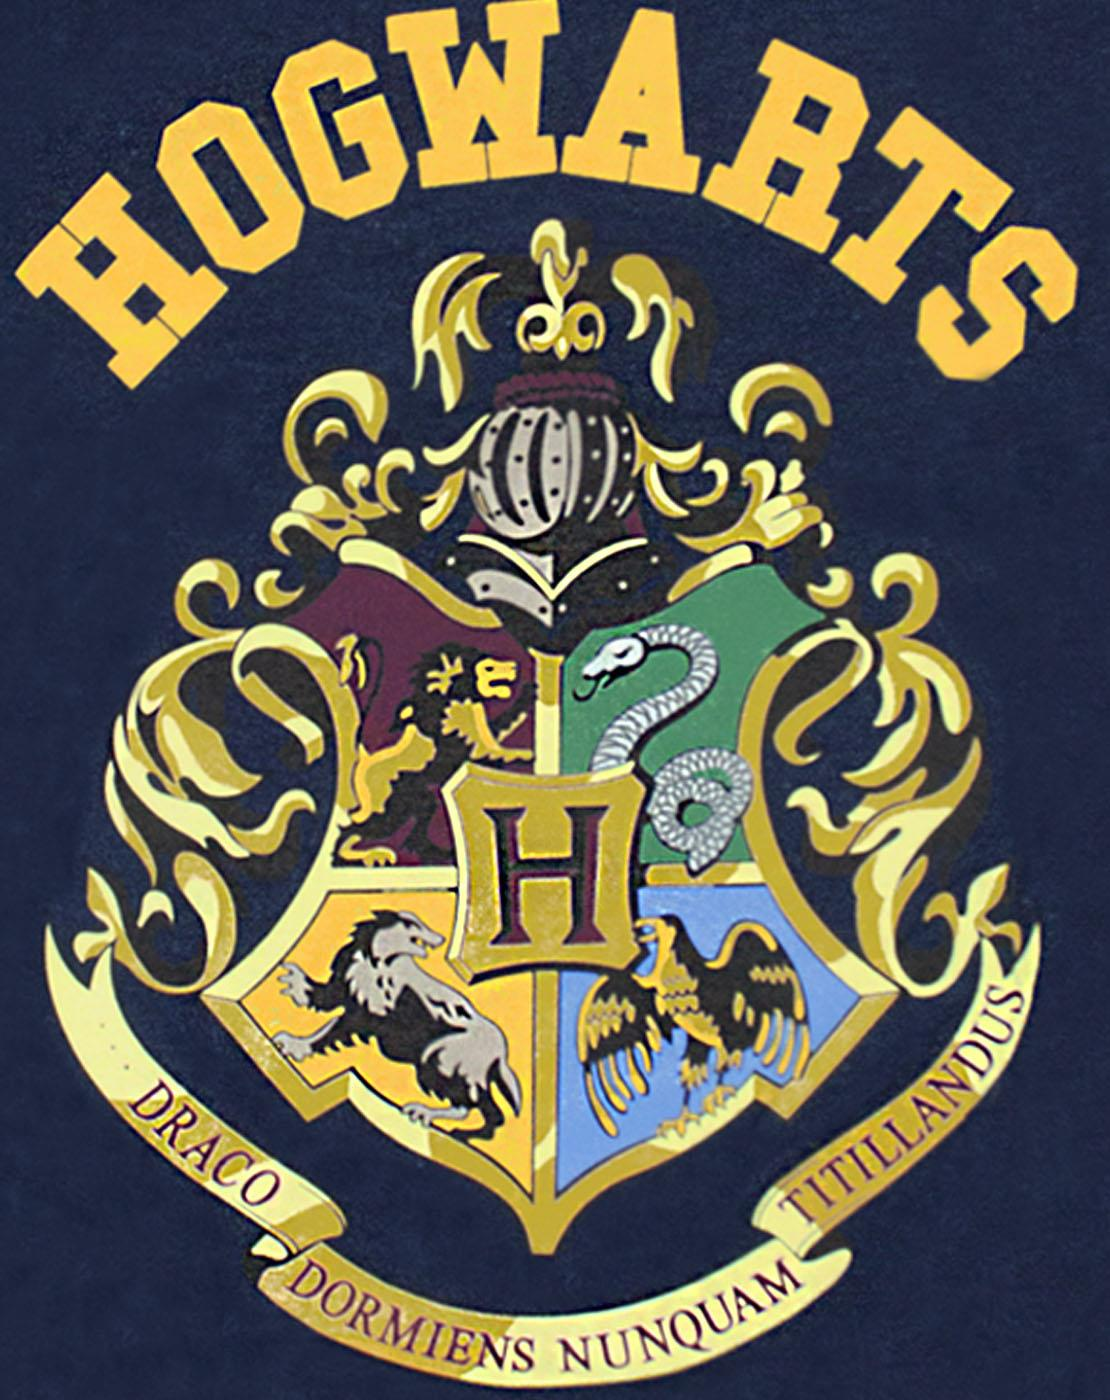 Harry-Potter-Hogwarts-Crest-Boy-039-s-Short-Sleeve-T-Shirt-in-Navy thumbnail 8